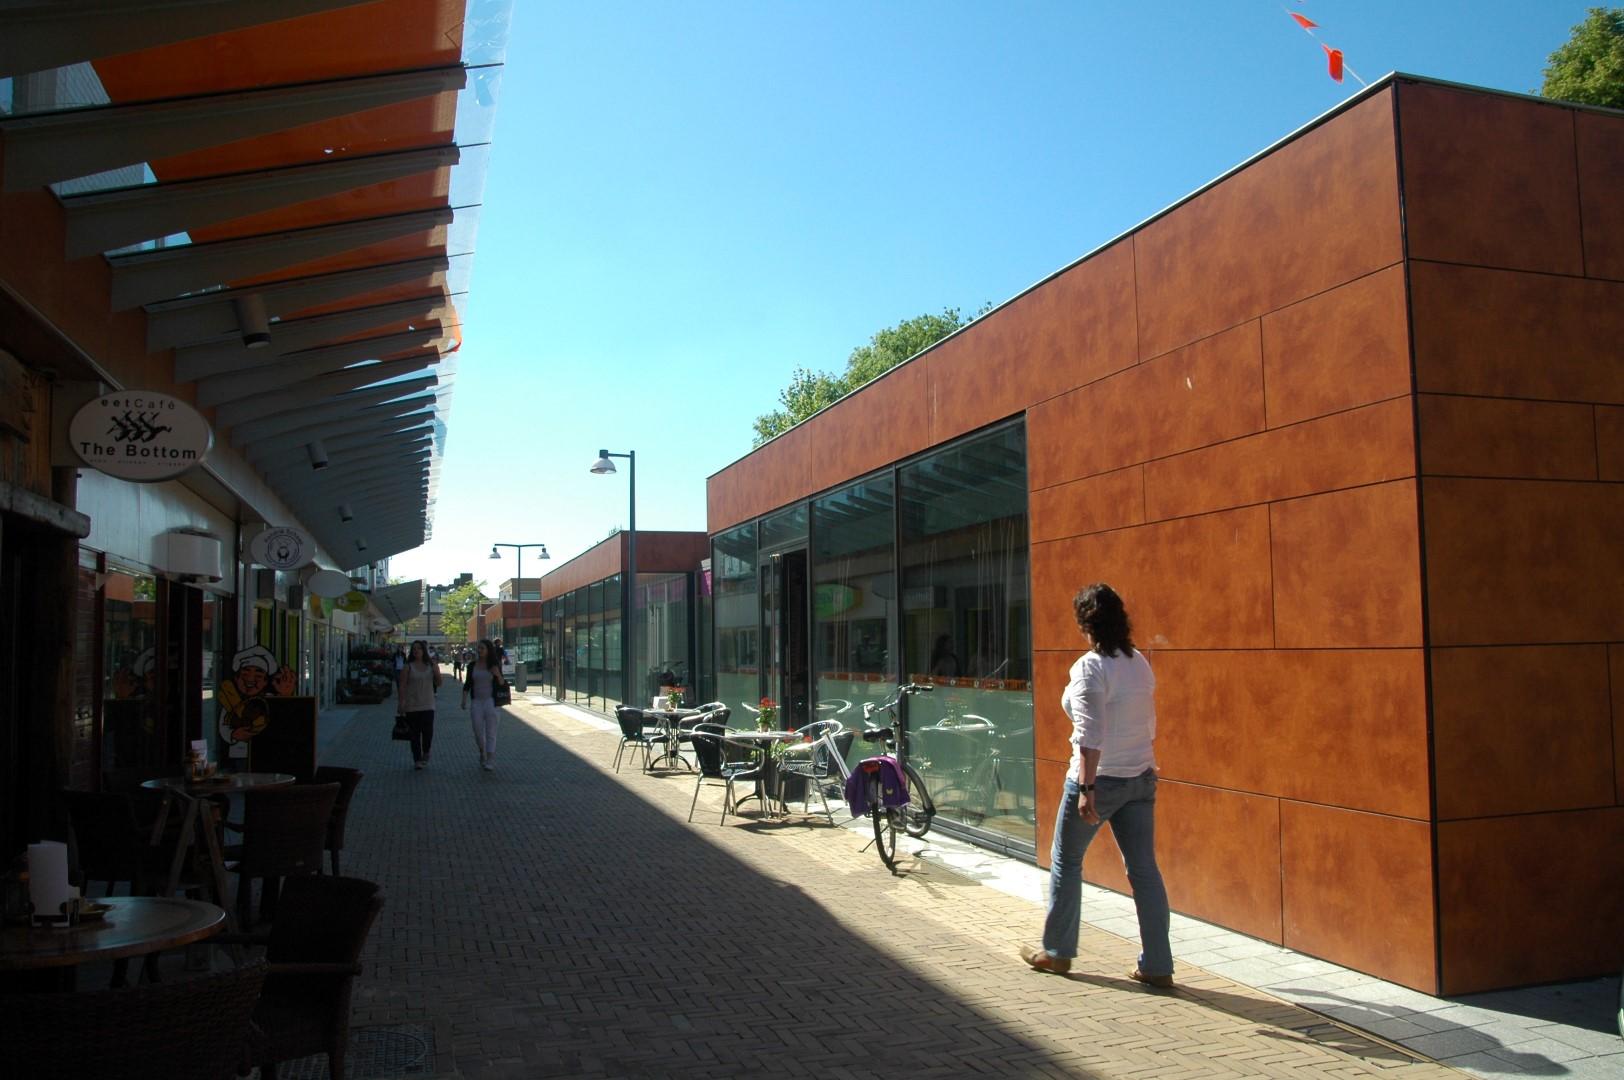 stoel_architect_Kampen_nieuwbouw_winkelcentrum Emmeloord (5) (Large)